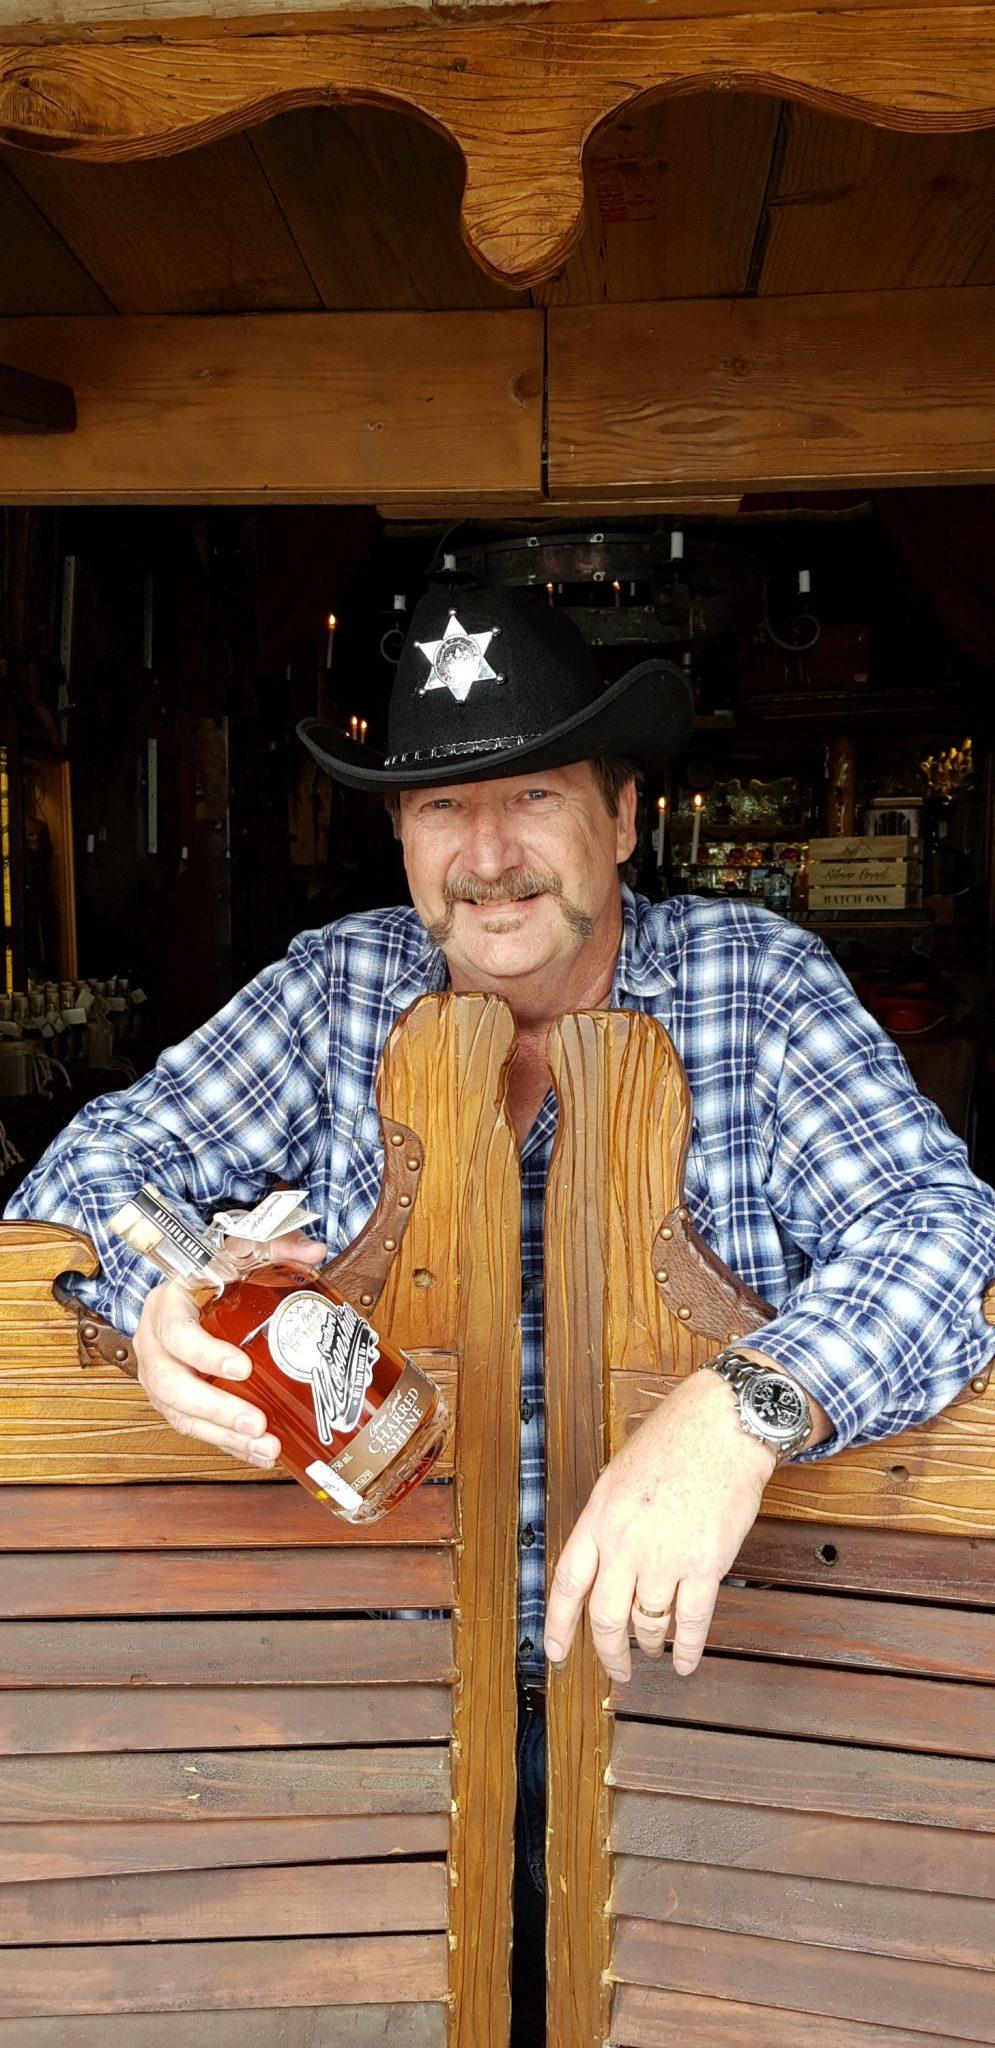 Mark Taverner silver creel sonia cabano blog eatdrinkcapetown